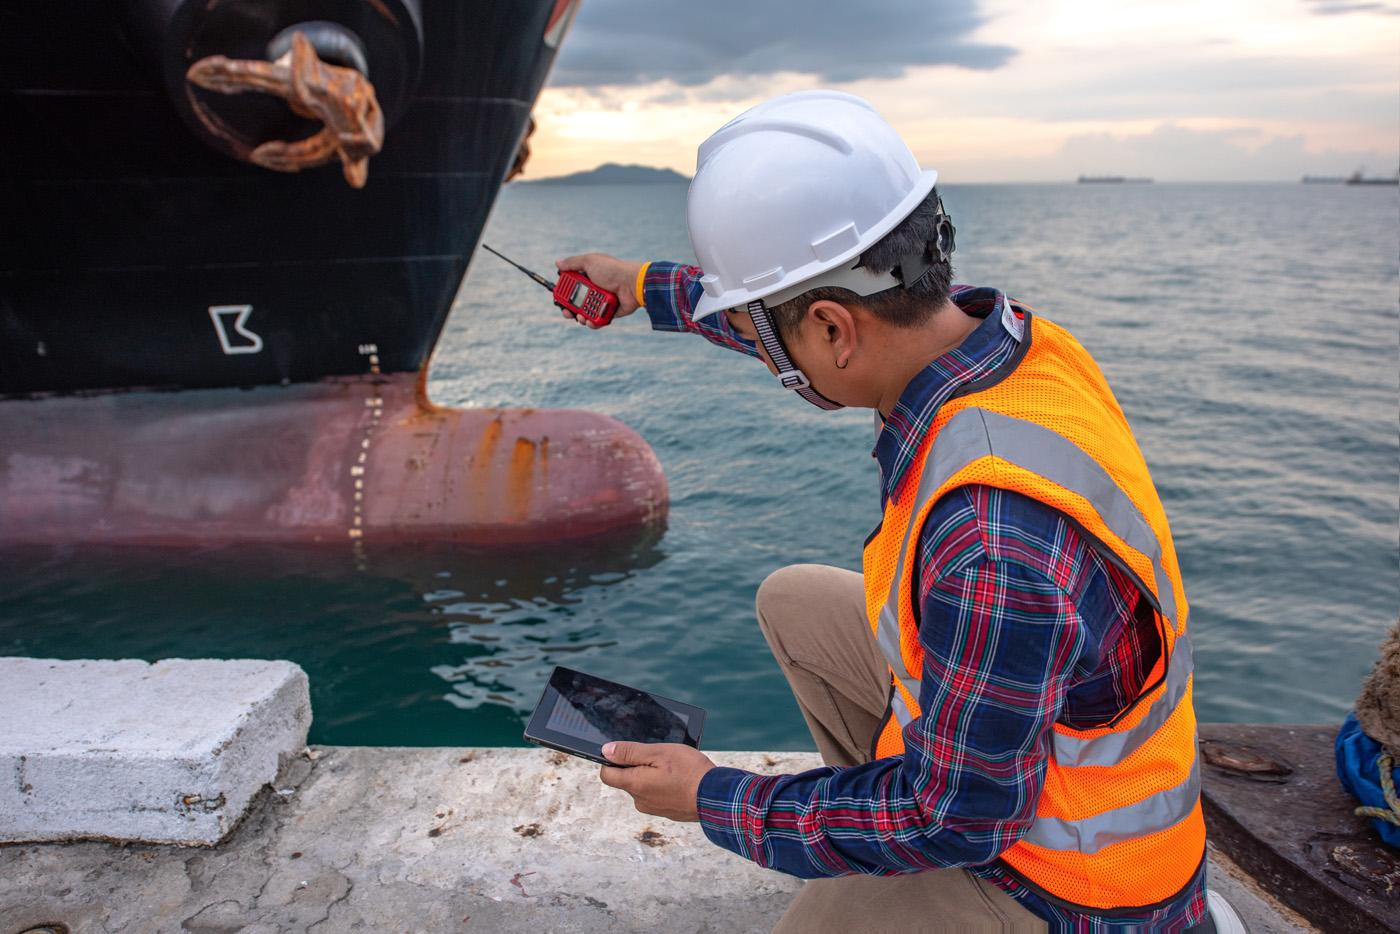 Prepurchase Inspection Vessel